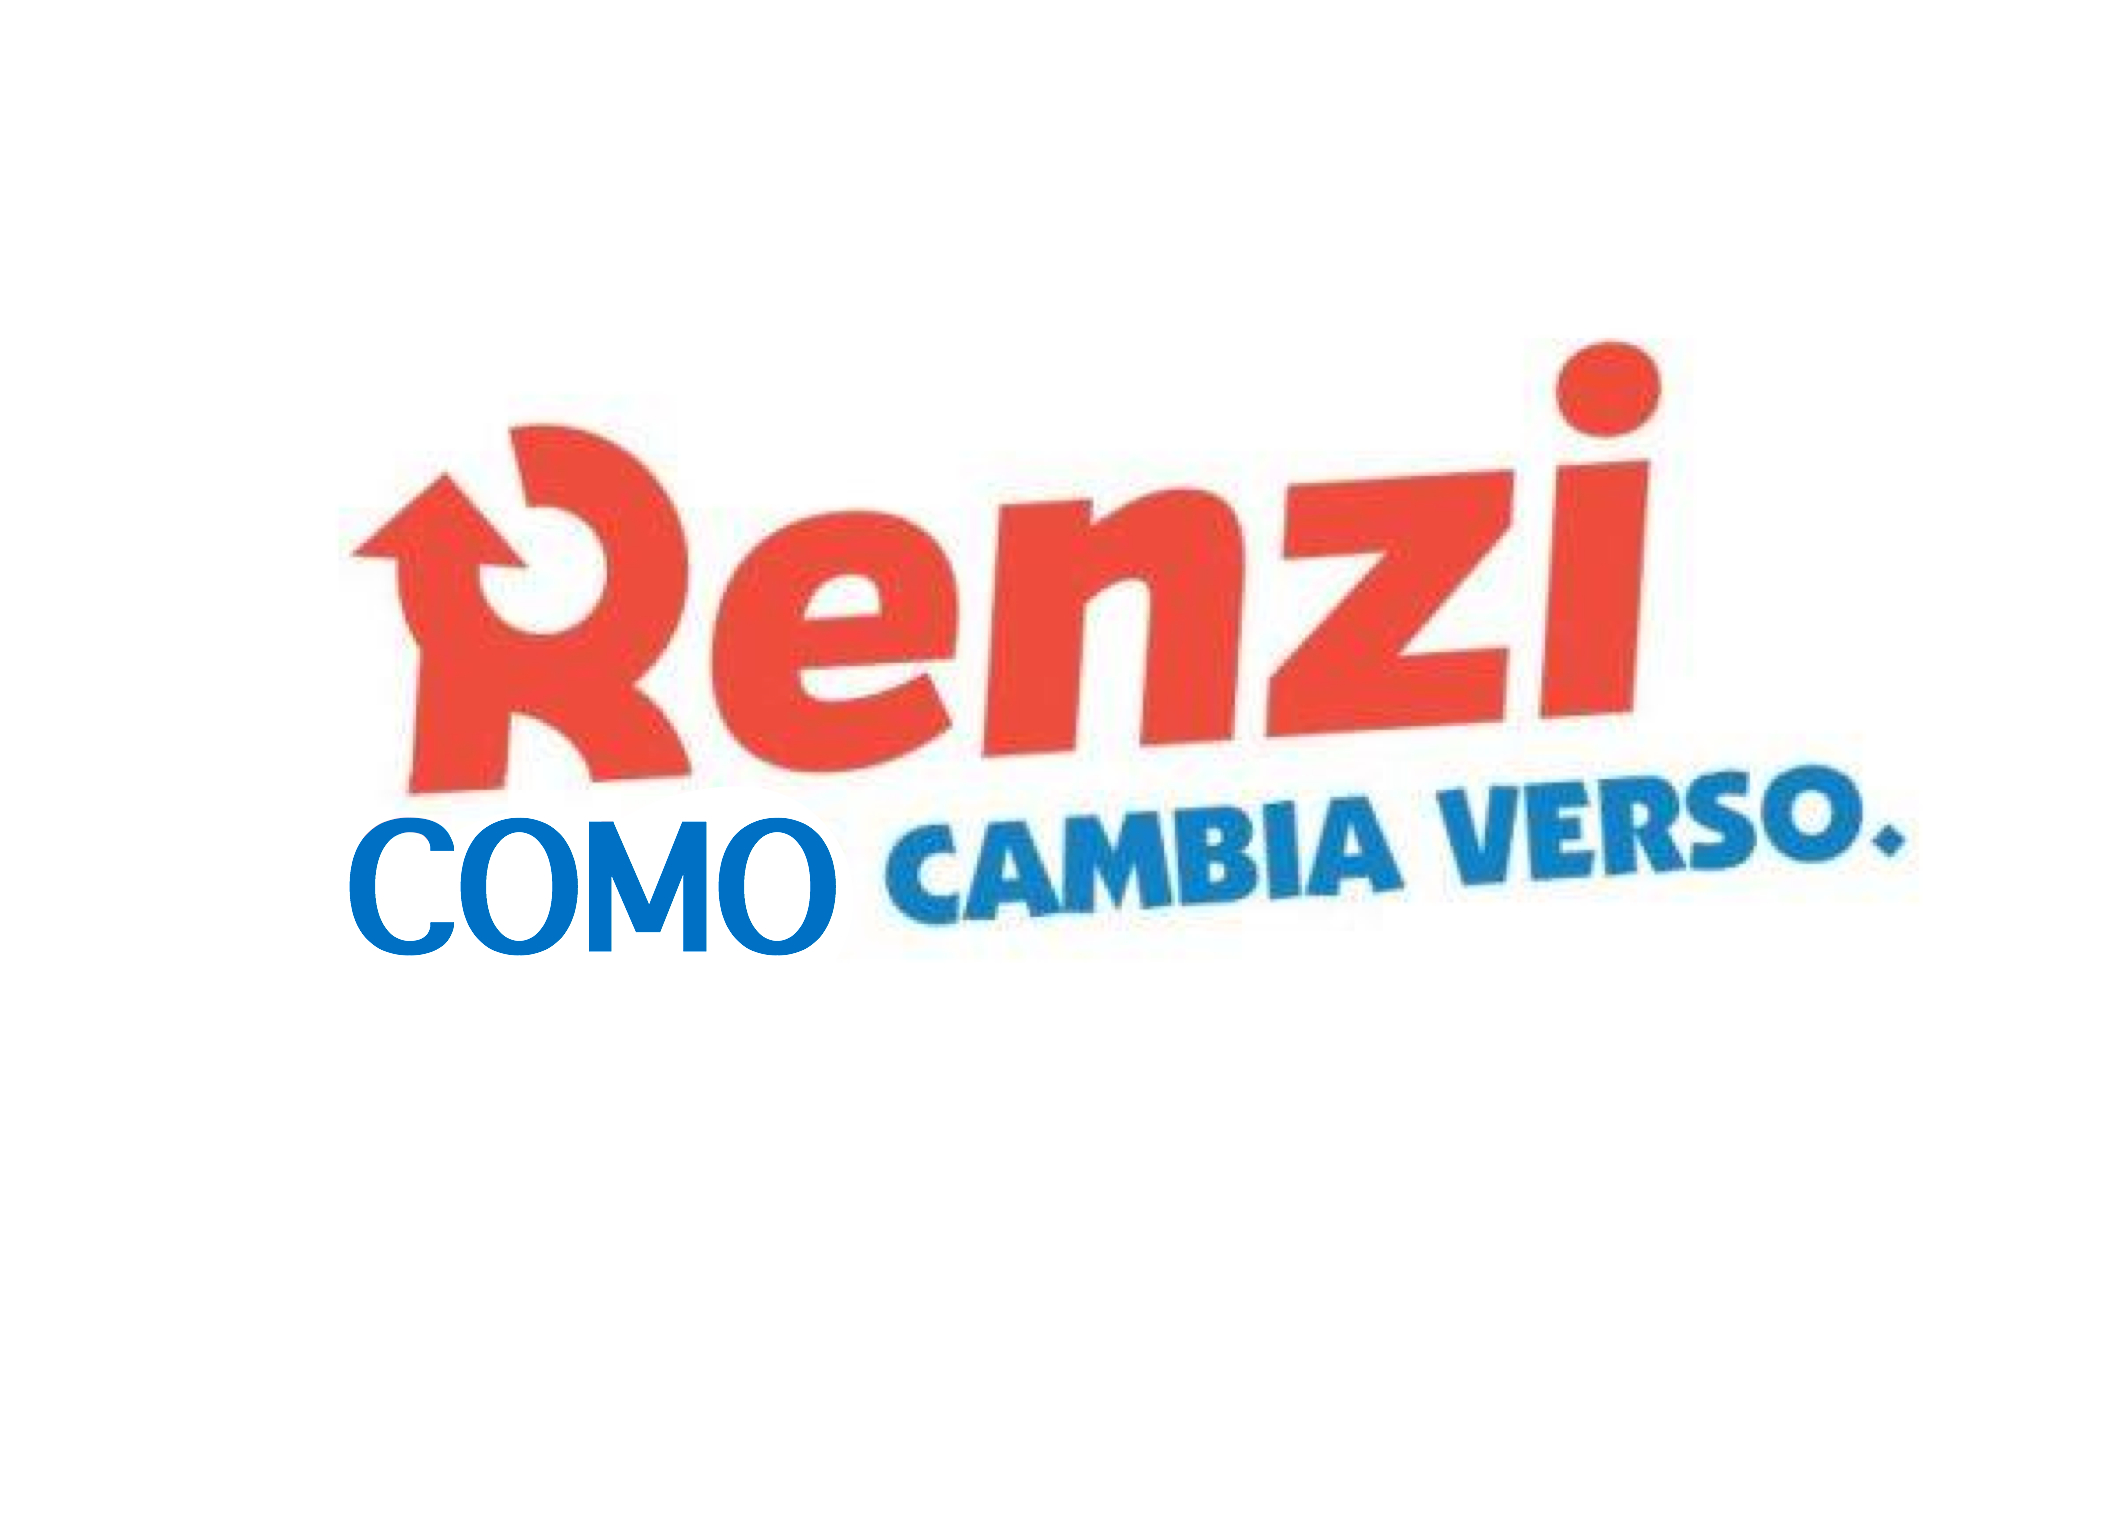 Comaschi per Renzi